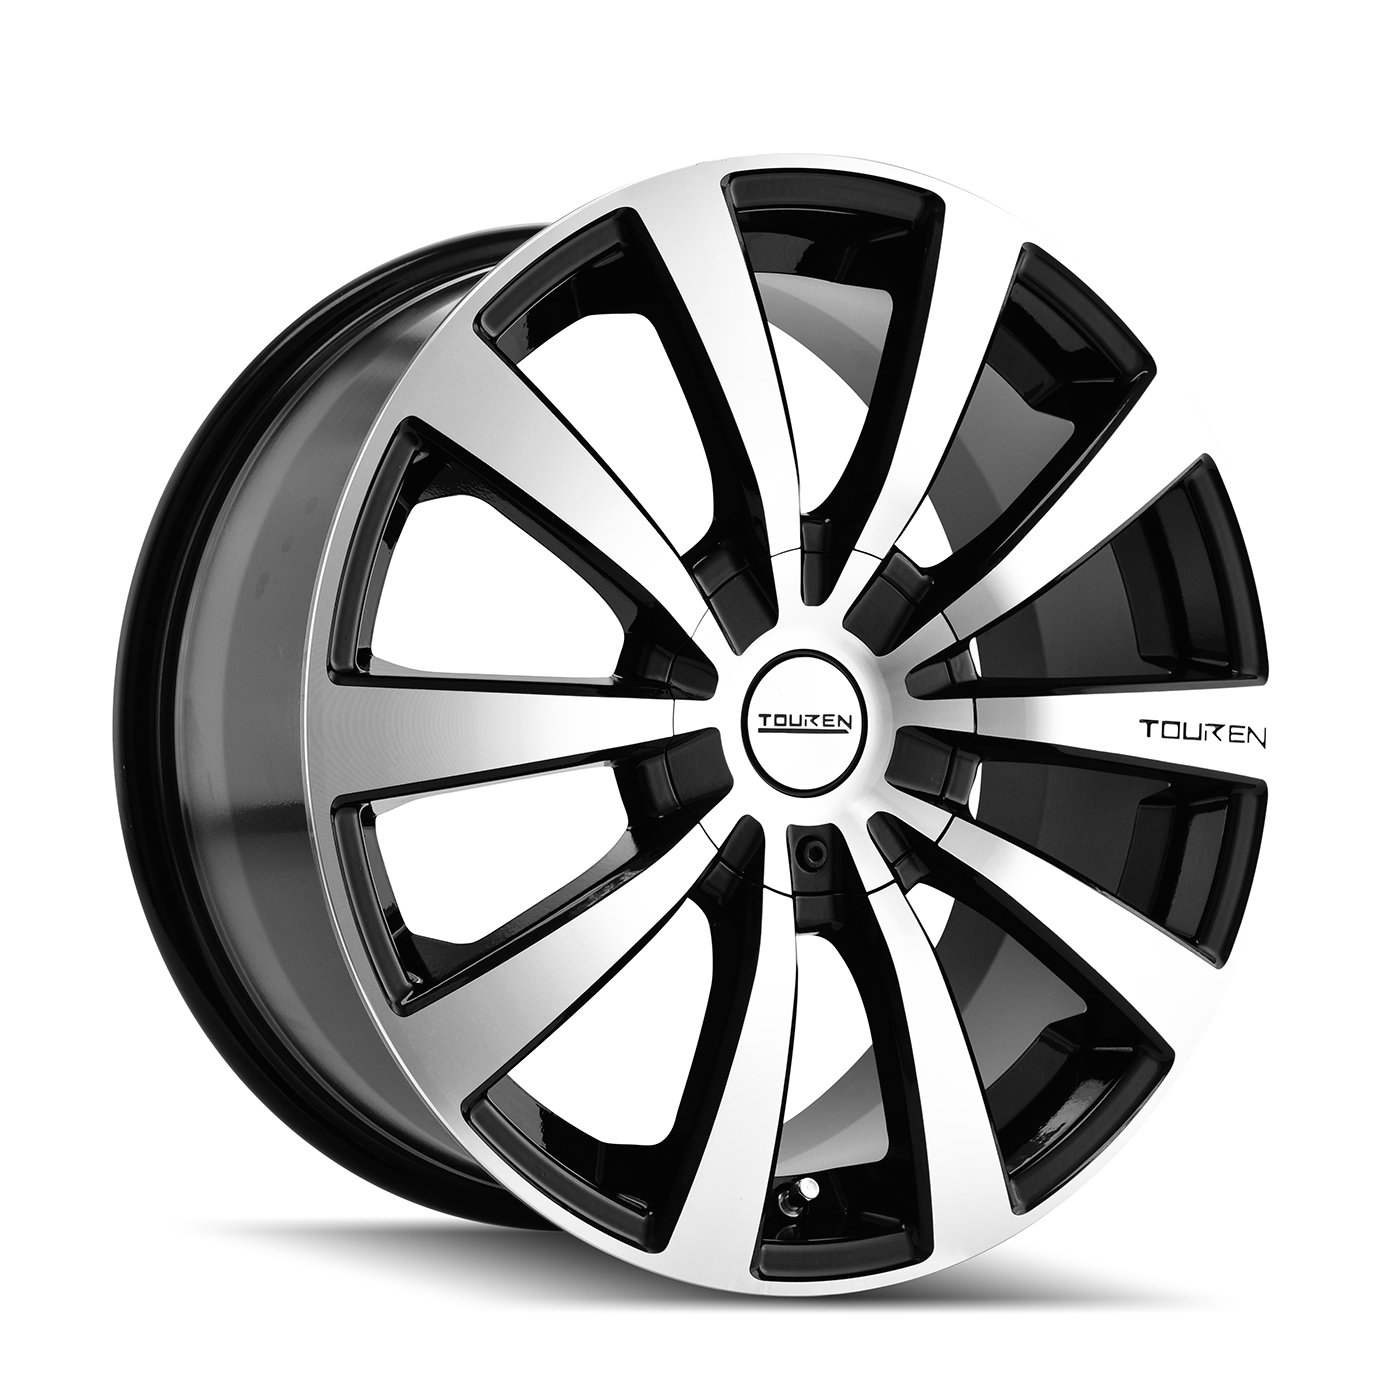 Touren TR3 3130 Black Wheel with Machined Face (16x7''/10x105mm)